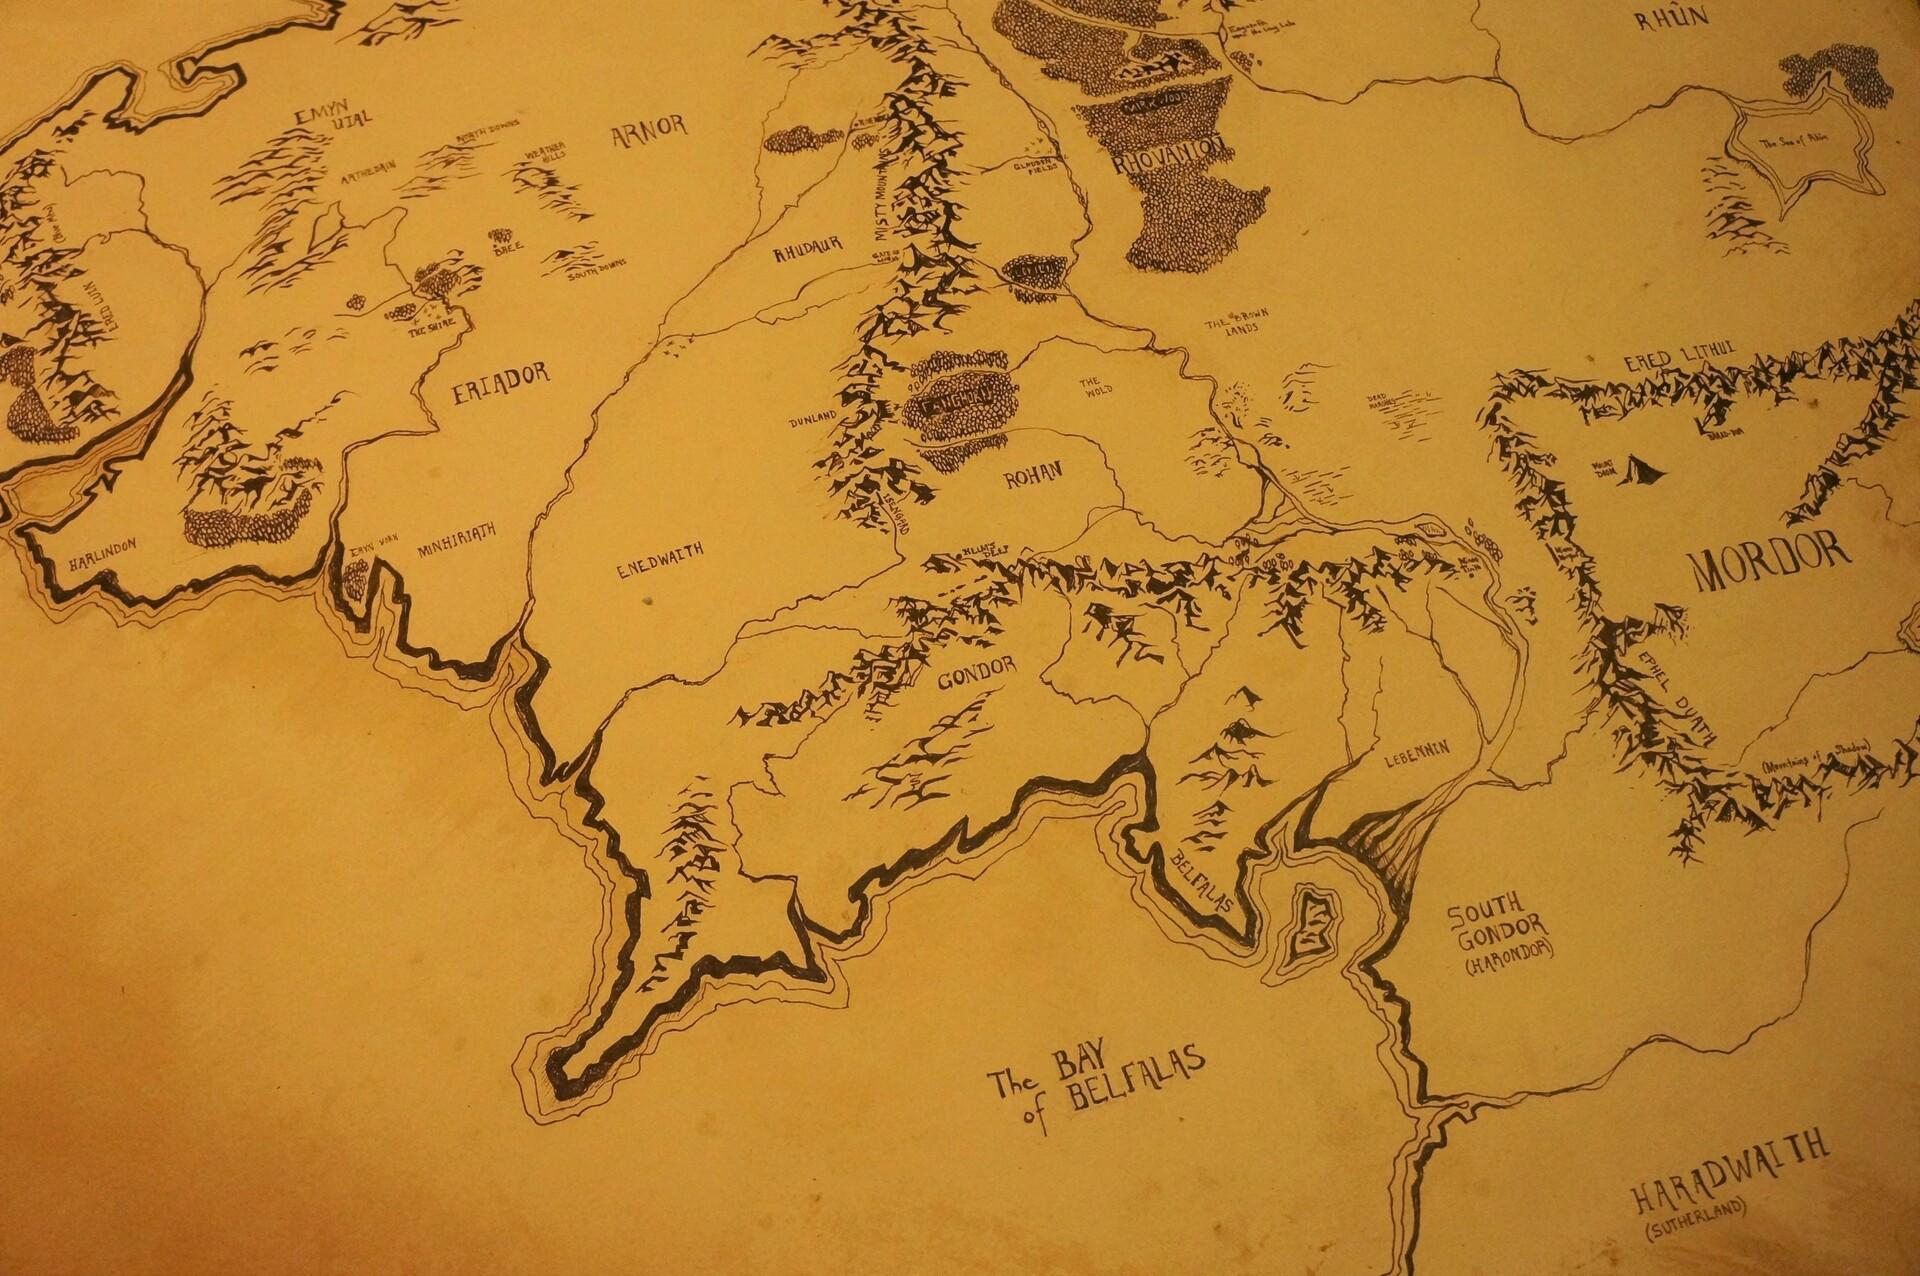 Map Of Middle Earth Papel De Parede Hd Plano De Fundo